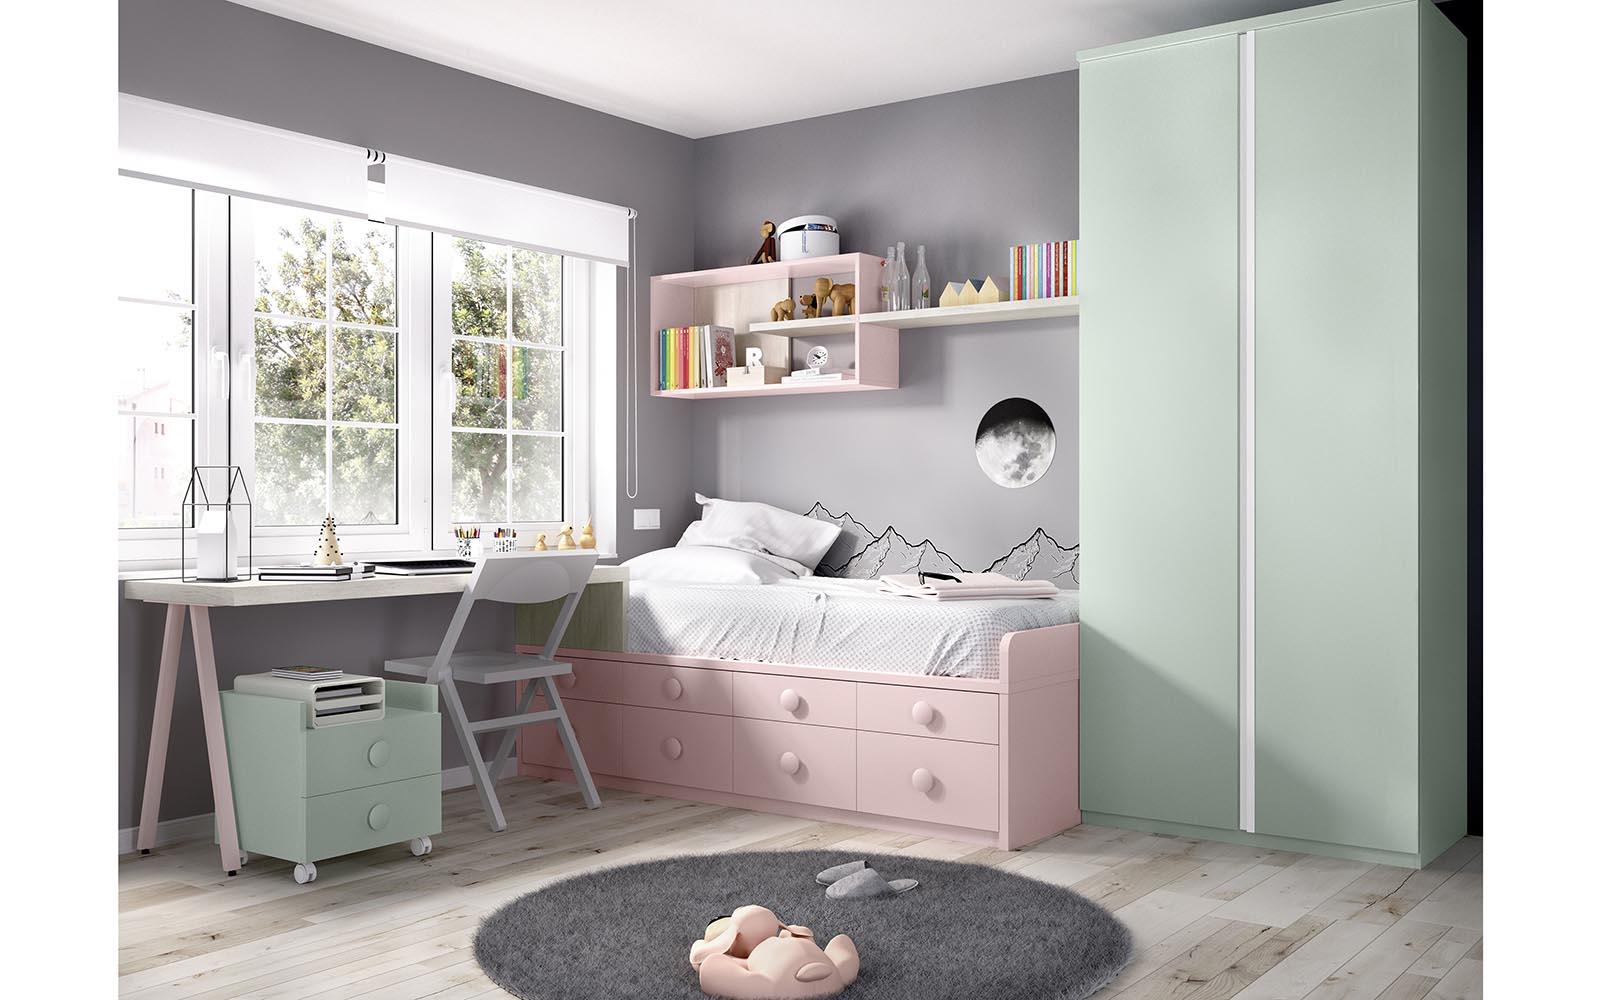 pink kids bedroom, kids bed adjustable to all sizes with space on the bottom of the bed, roz krevati paidiko me ermarakia sto kato meros tou krevatiou, koritsistiko krevati ,girly bedroom,